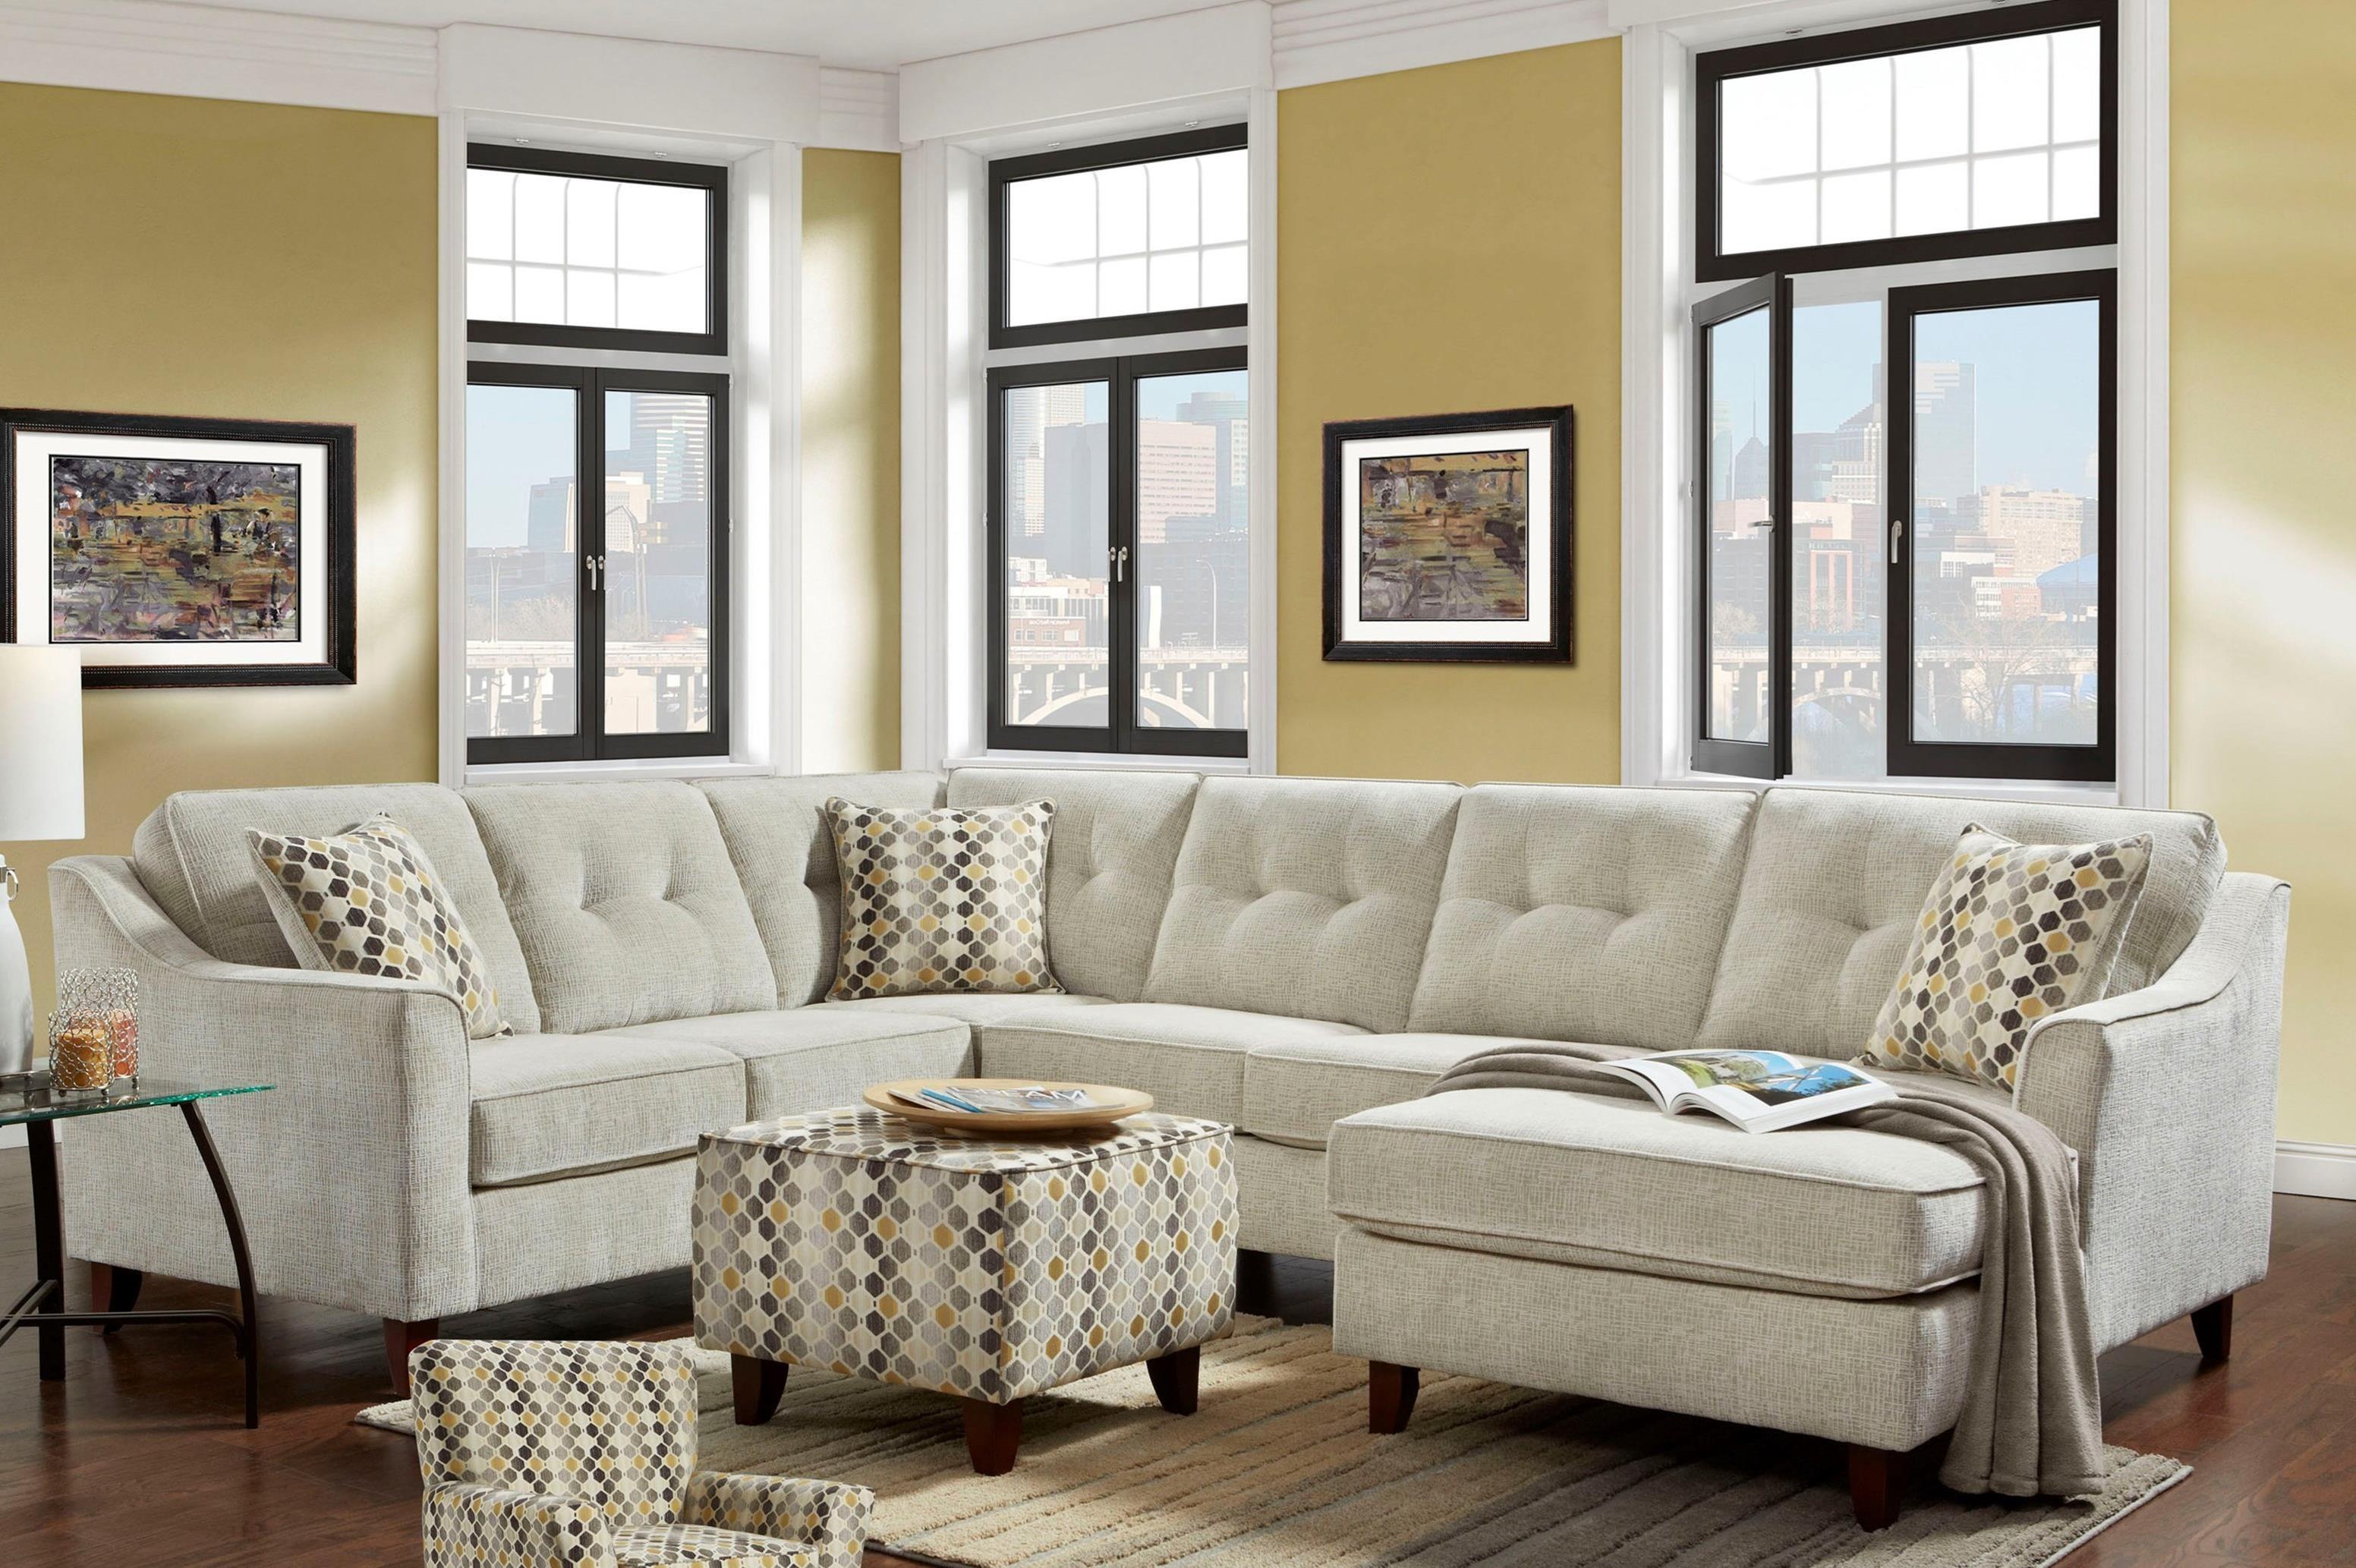 4740 5 Seat Sectional by Washington Furniture at Lynn's Furniture & Mattress